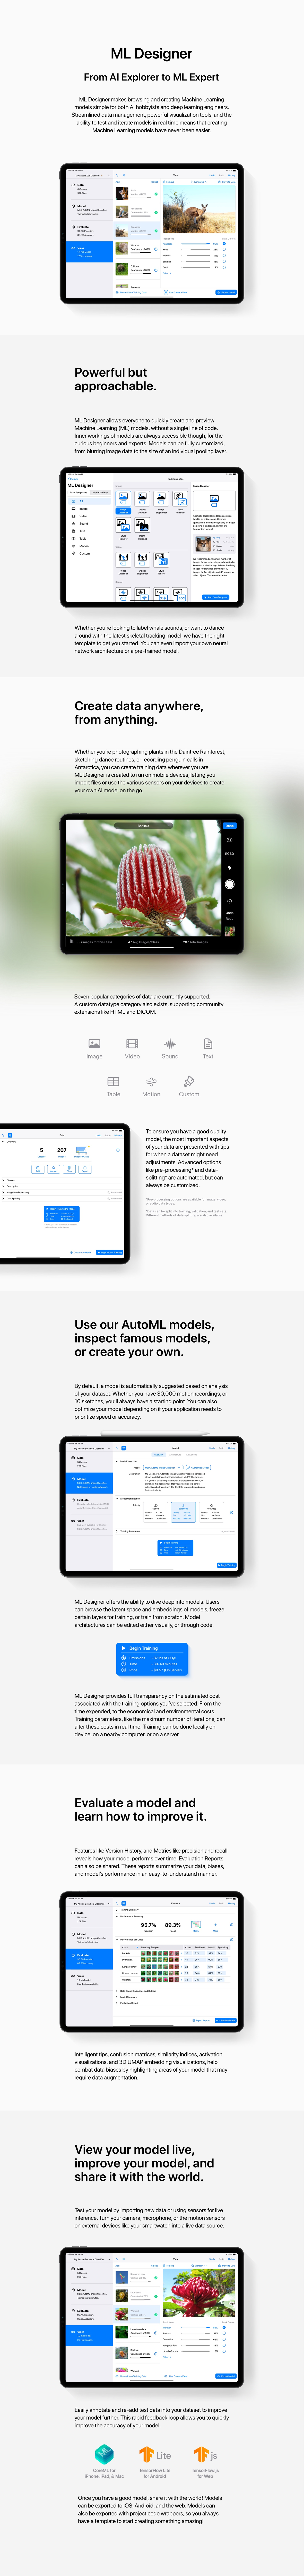 ML-Designer-Machine-Learning-Create-Concept.jpg